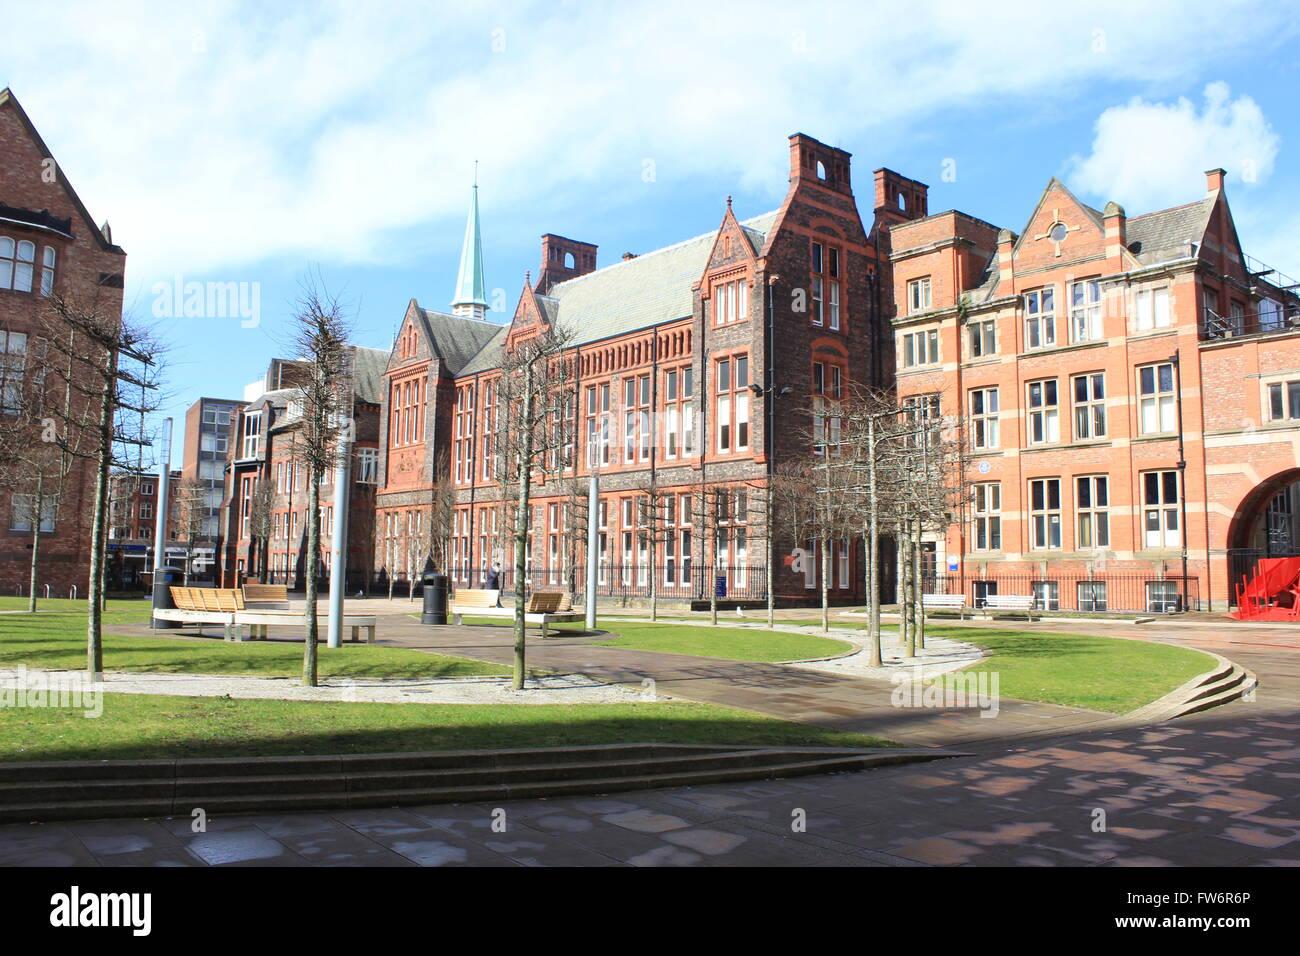 University of Liverpool School of Engineering - the quadrangle - Stock Image